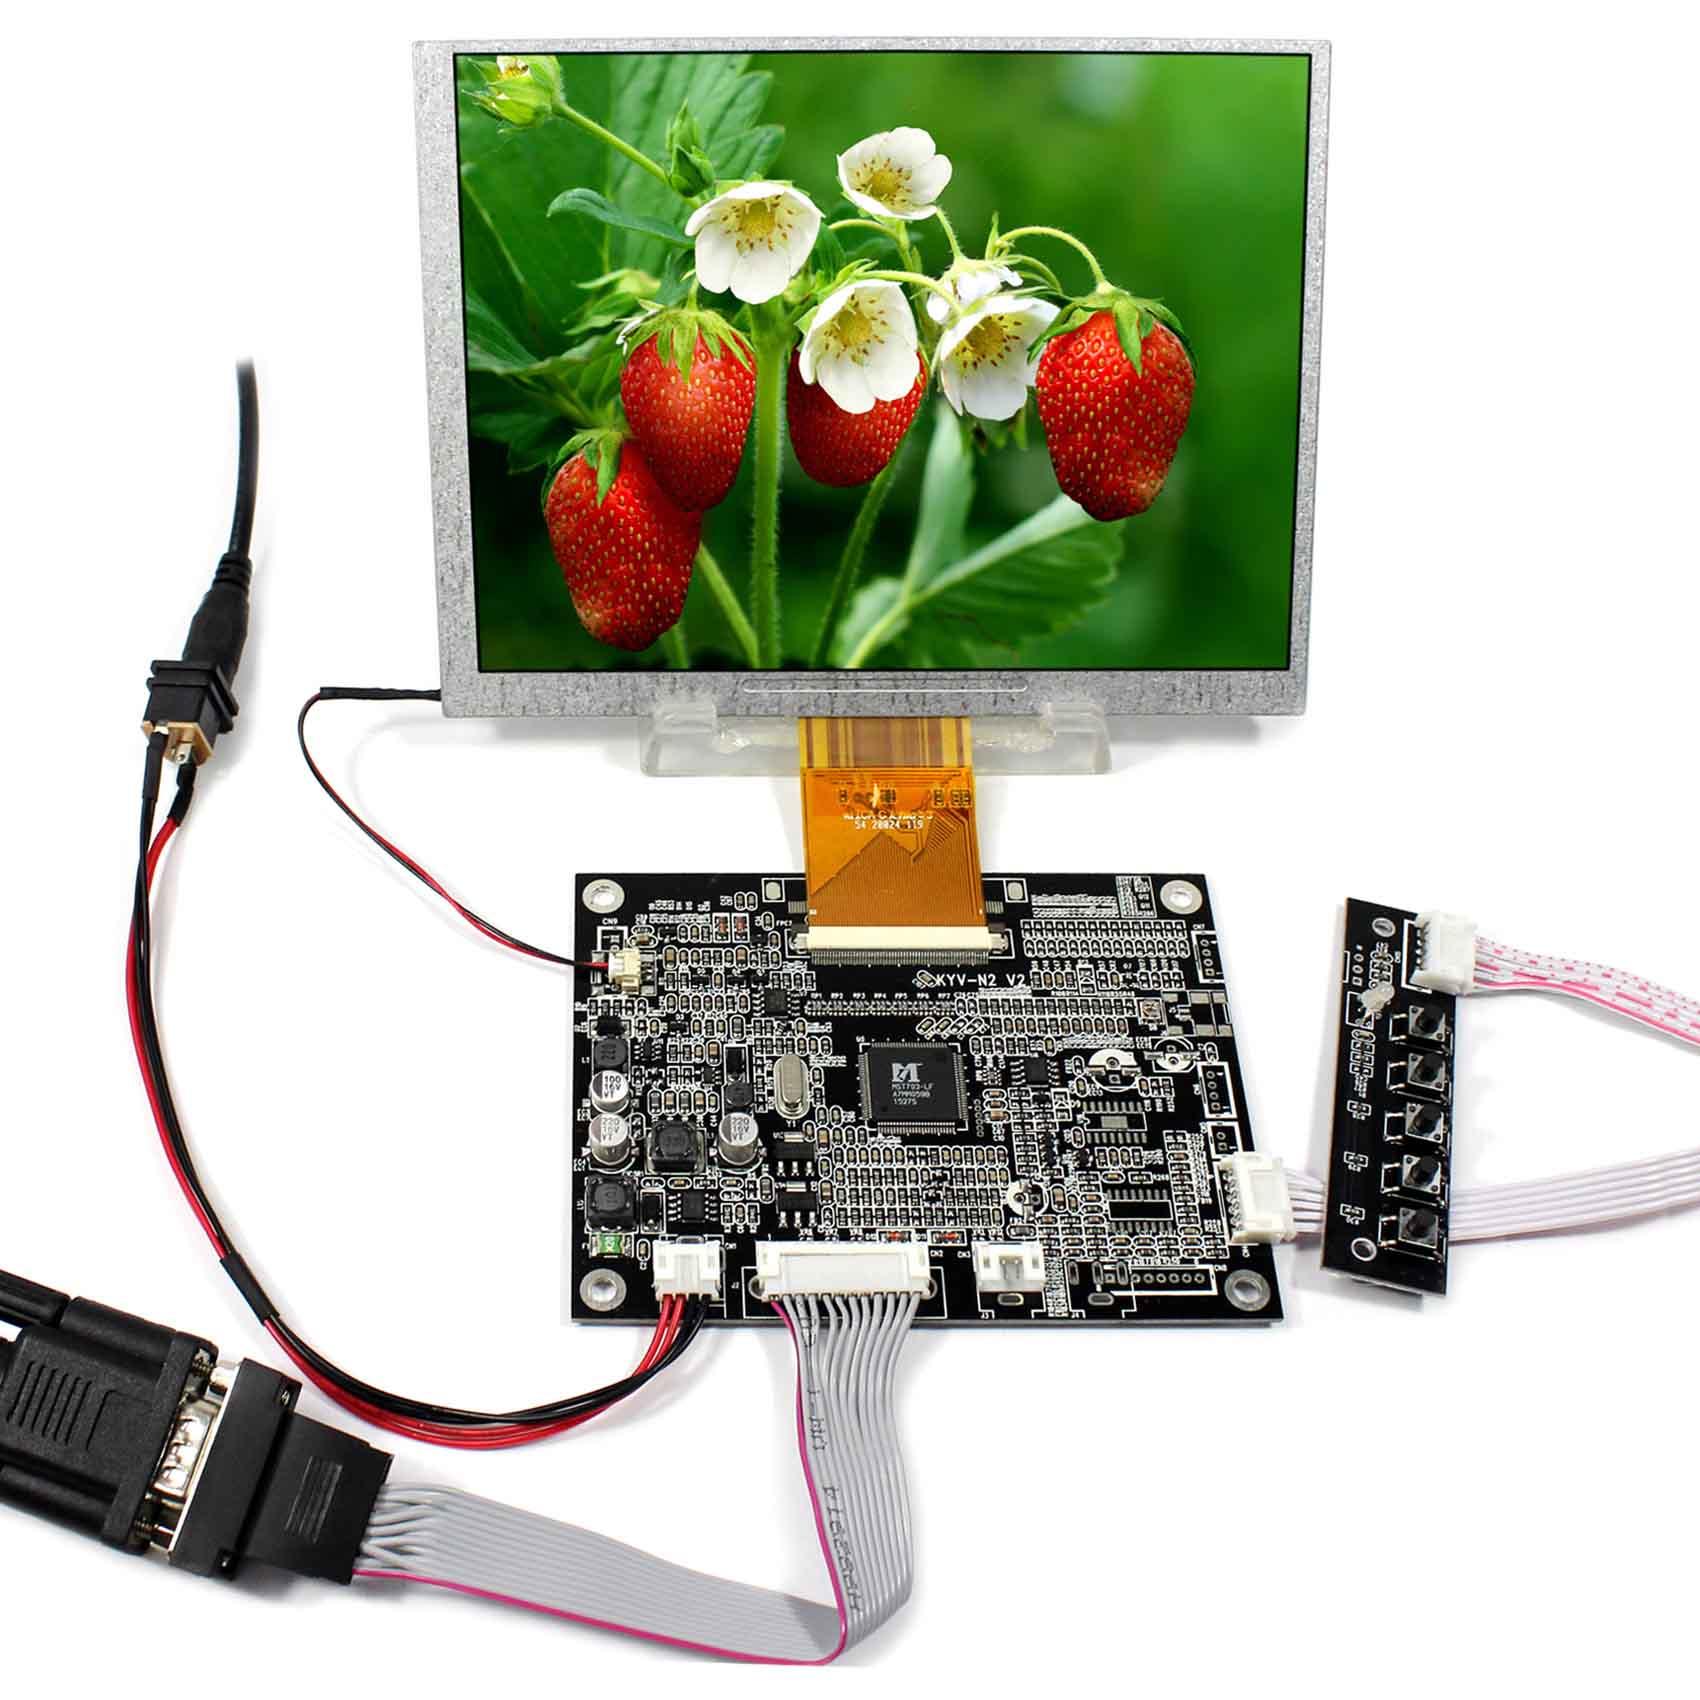 7 800x600 VGA LCD Controller Board 7inch LCD Screen KYV-N2 V2 A070SN027 800x600 VGA LCD Controller Board 7inch LCD Screen KYV-N2 V2 A070SN02